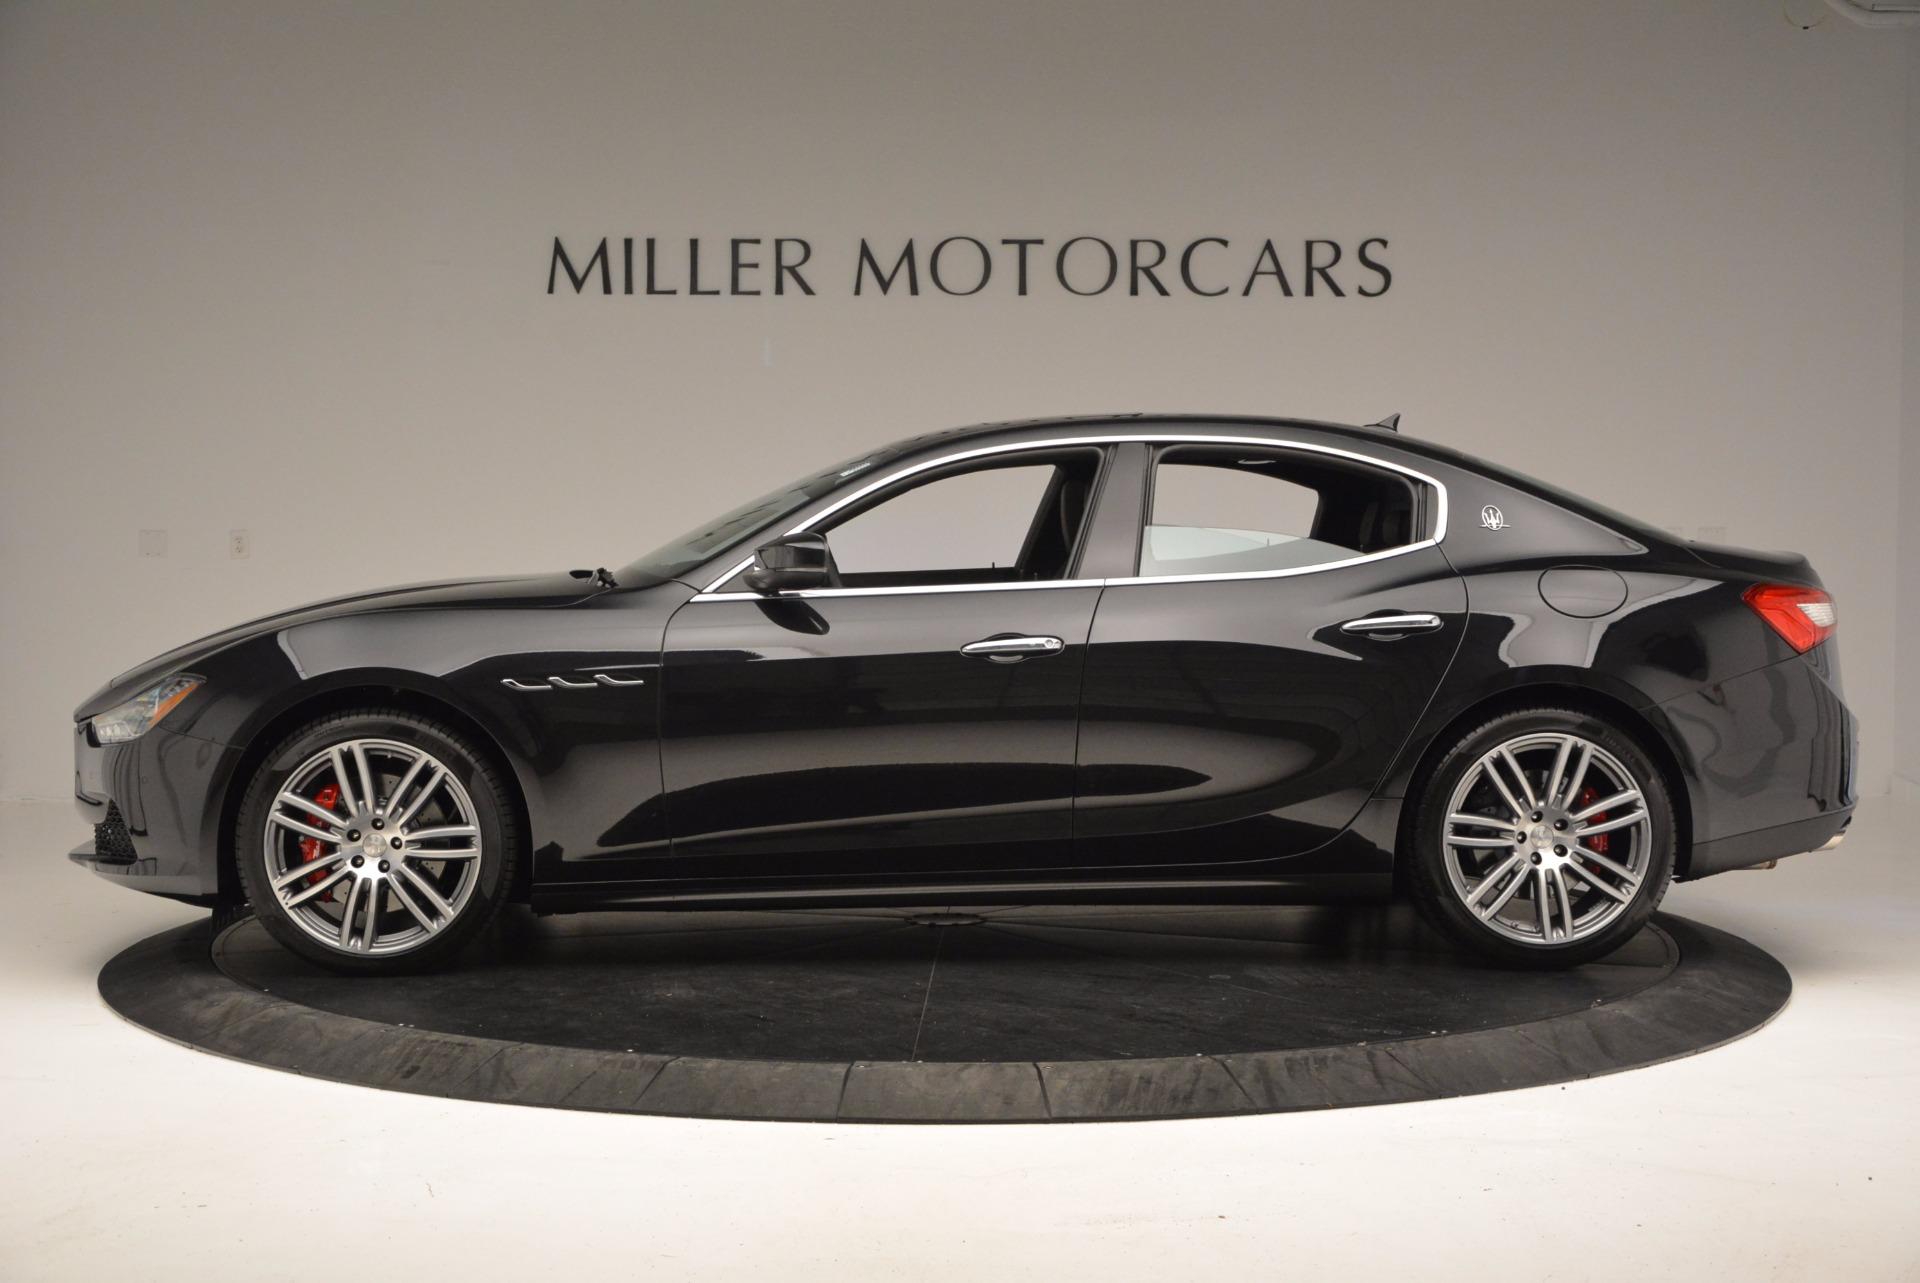 New 2017 Maserati Ghibli SQ4 For Sale In Westport, CT 1108_p3